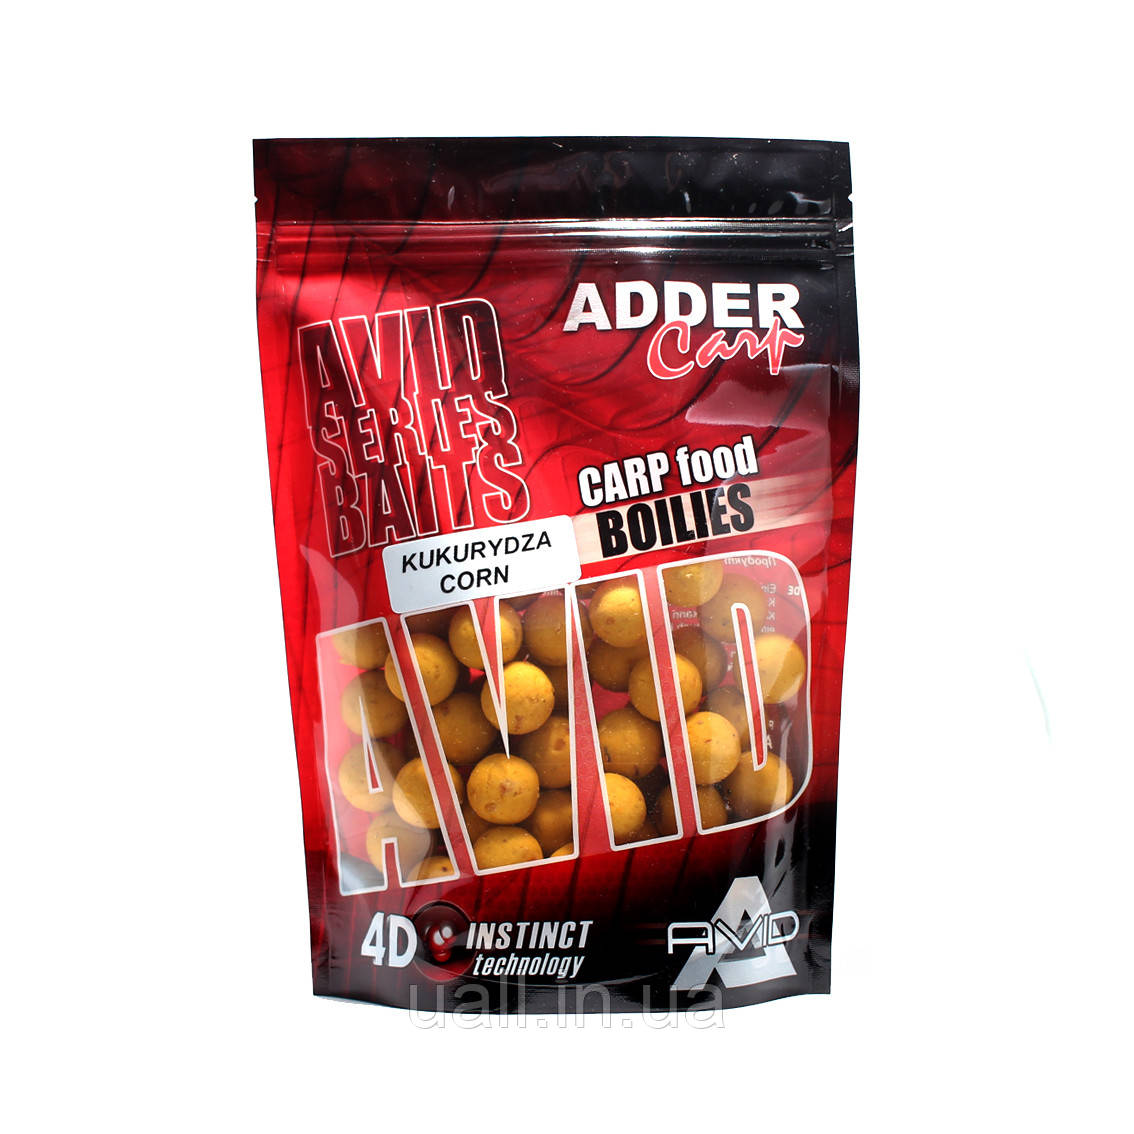 Бойли Adder Carp Boilies AVID Corn 1kg (18mm) (Кукурудза)